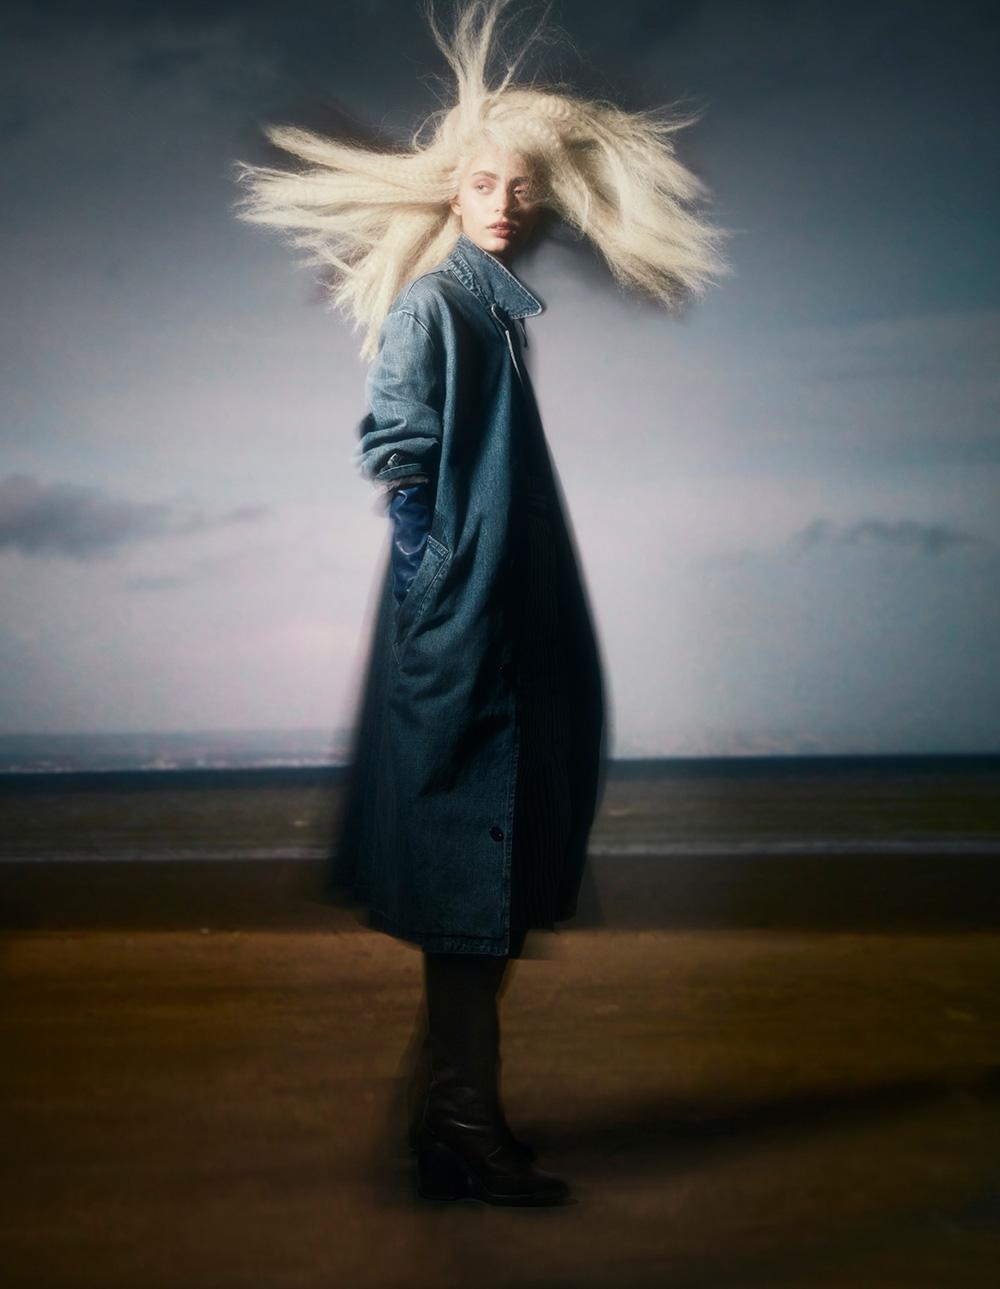 Patrycja Piekarska by Sølve Sundsbø for Vogue China November 2020